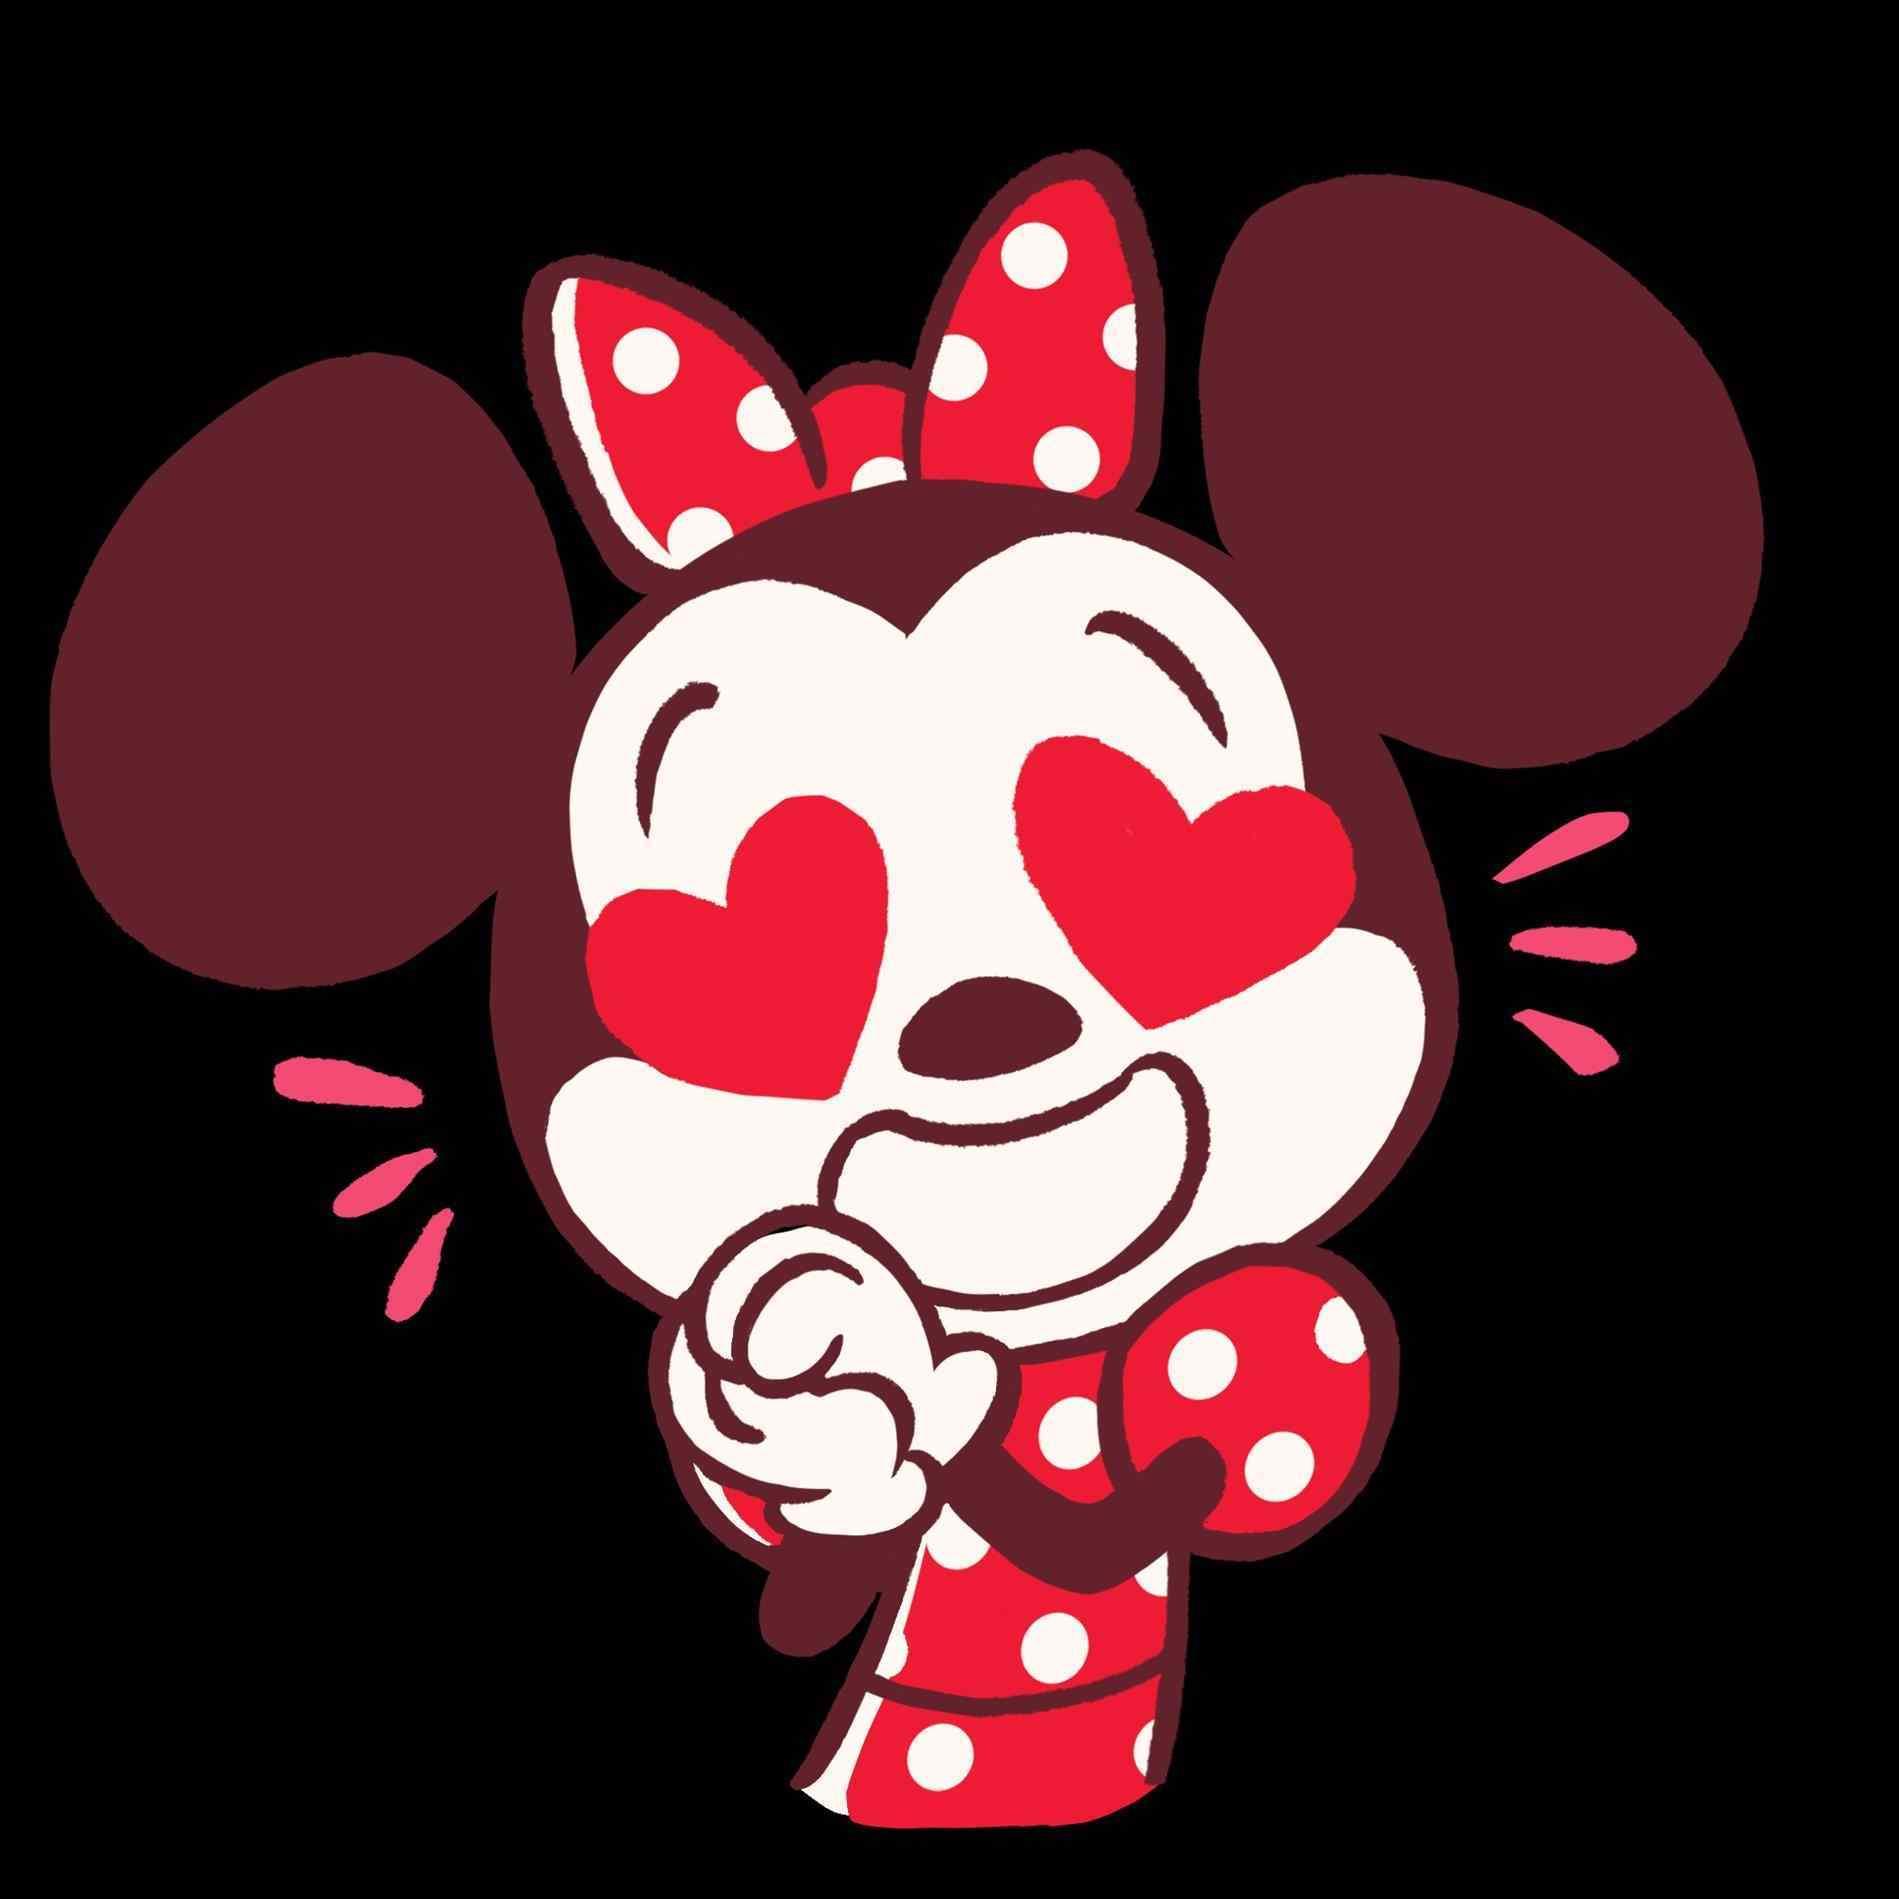 1899x1899 Disney Valentine Day Clip Art Your Meme Source